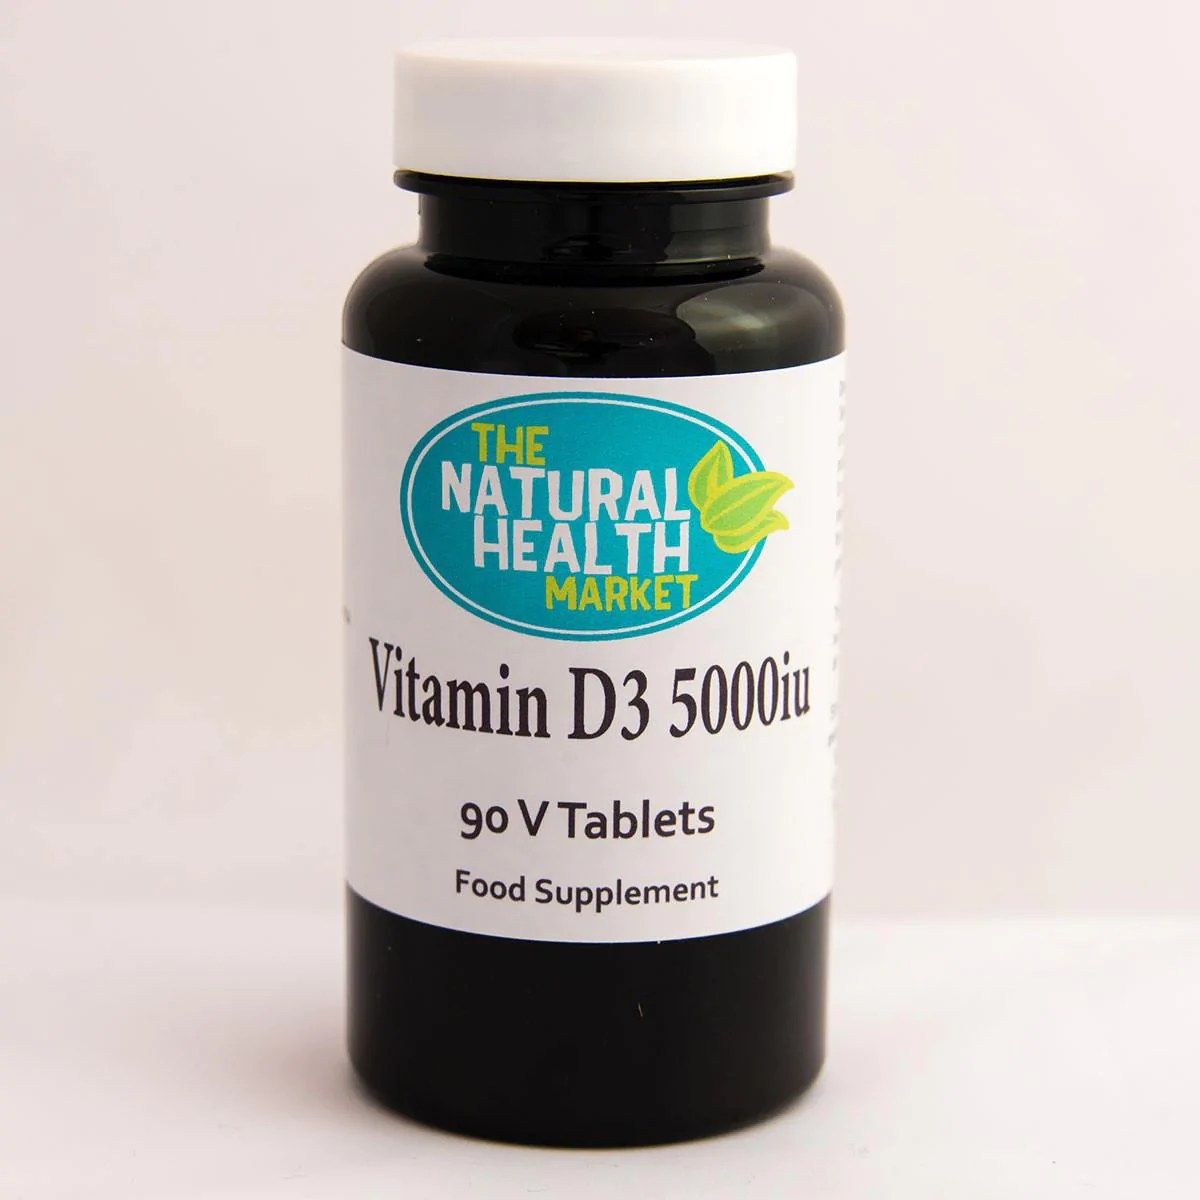 Vitamin D3 5000iu  Suitable For Vegans  The Natural